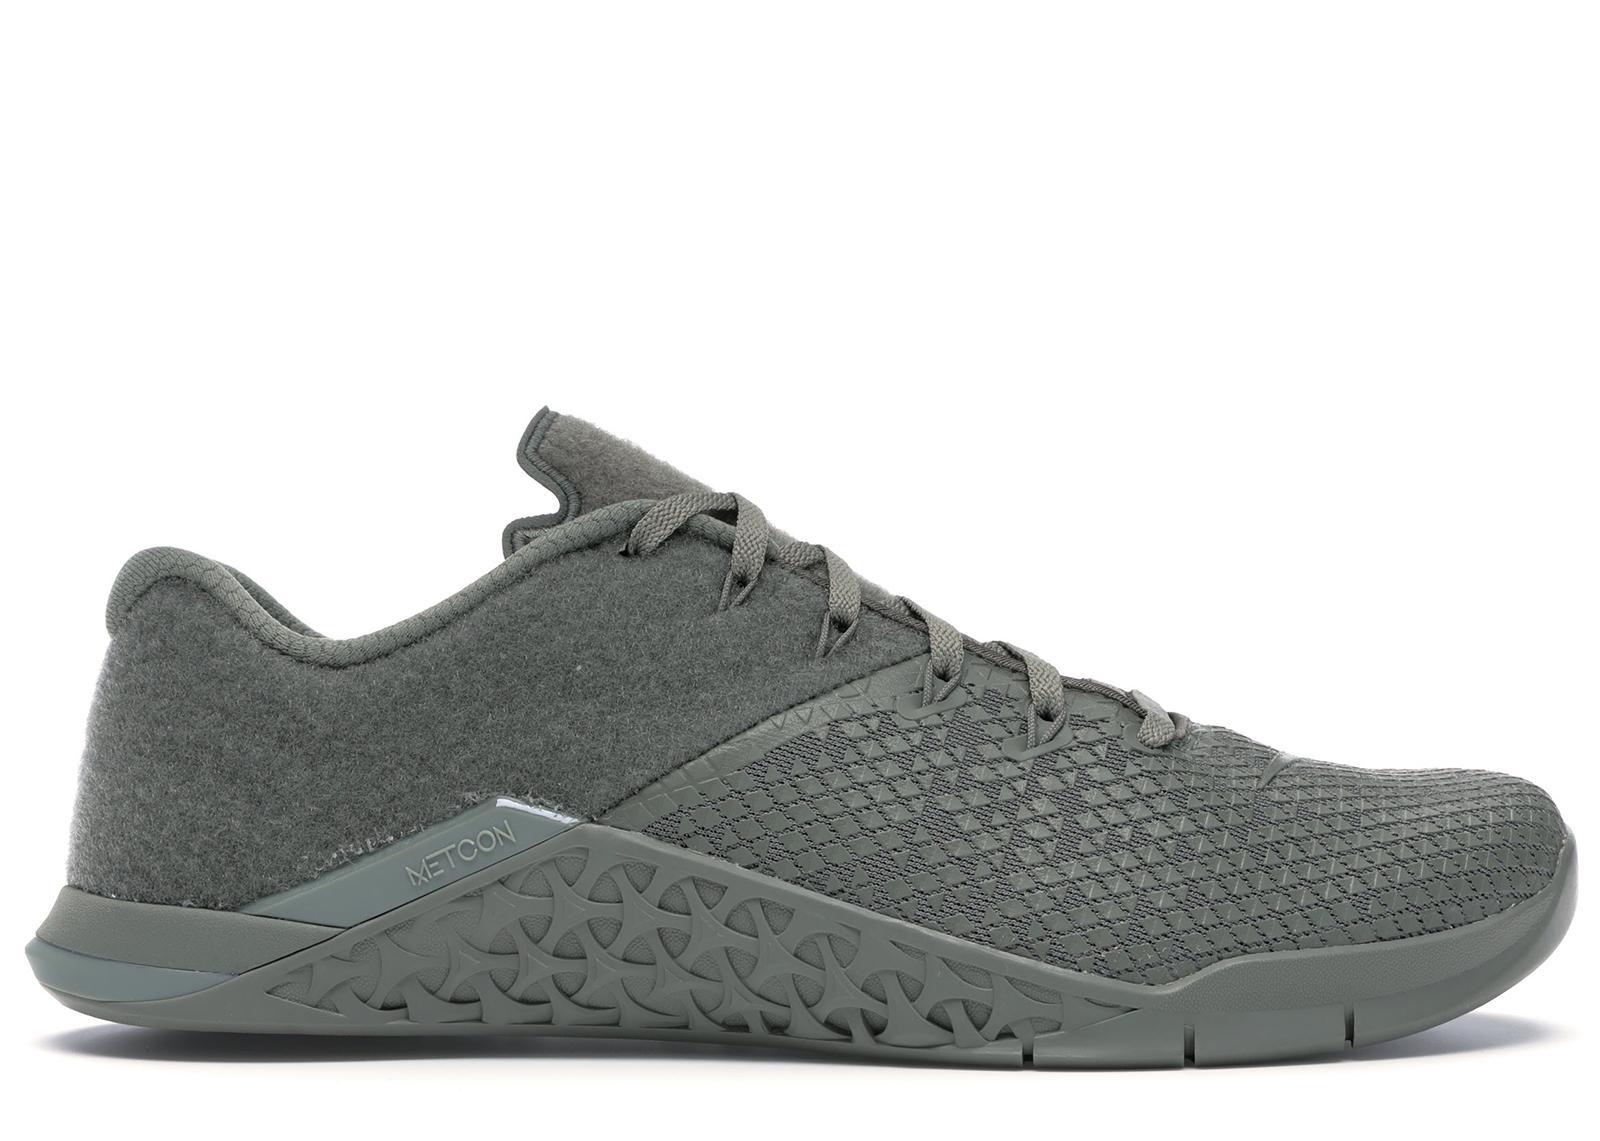 Nike Metcon 4 Patches Dark Stucco